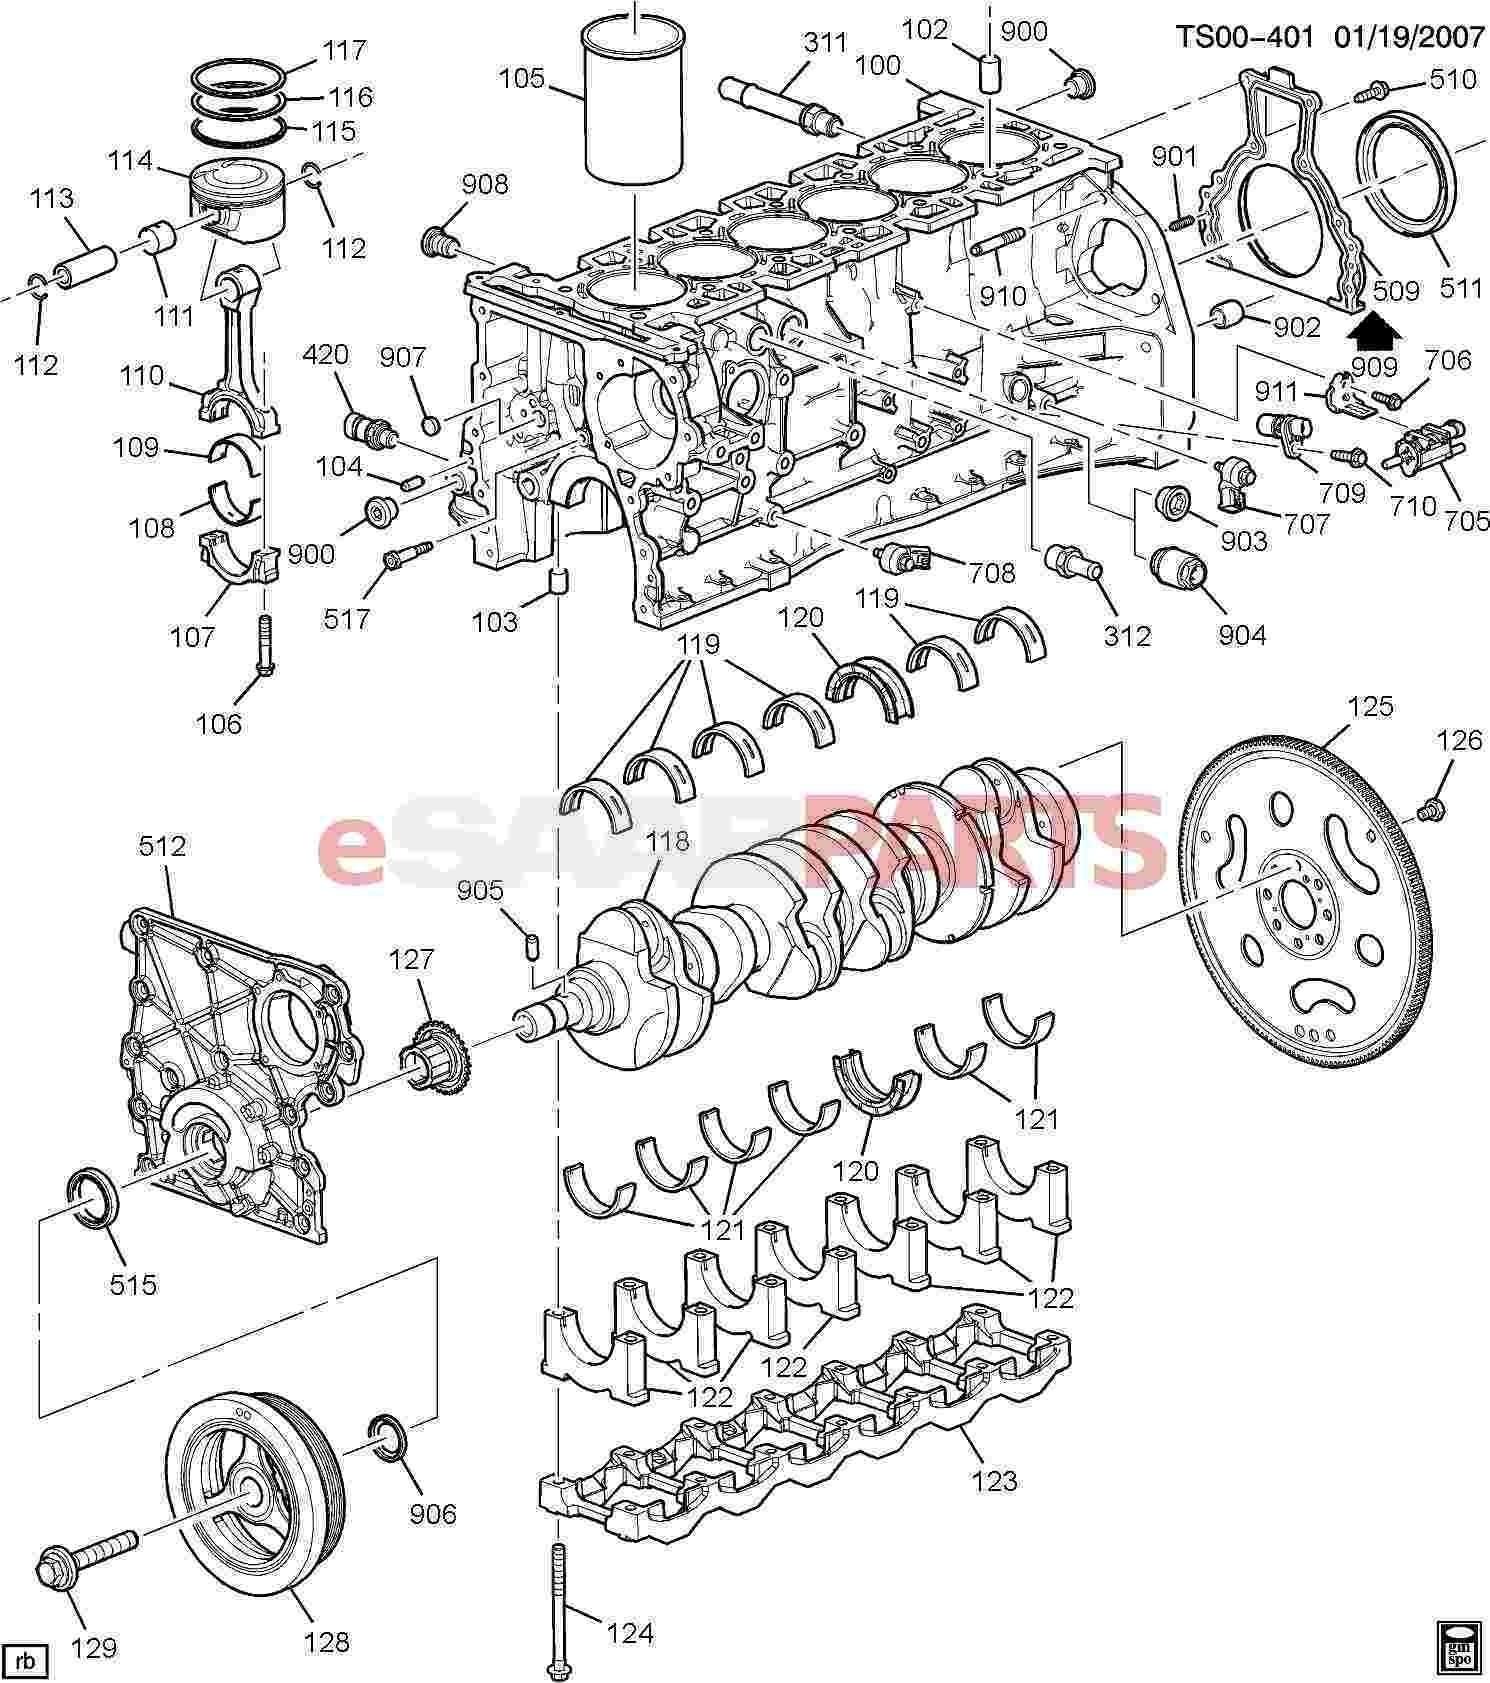 Hayward Navigator Parts Diagram 2001 Saab 9 5 Wiring Diagram Saab